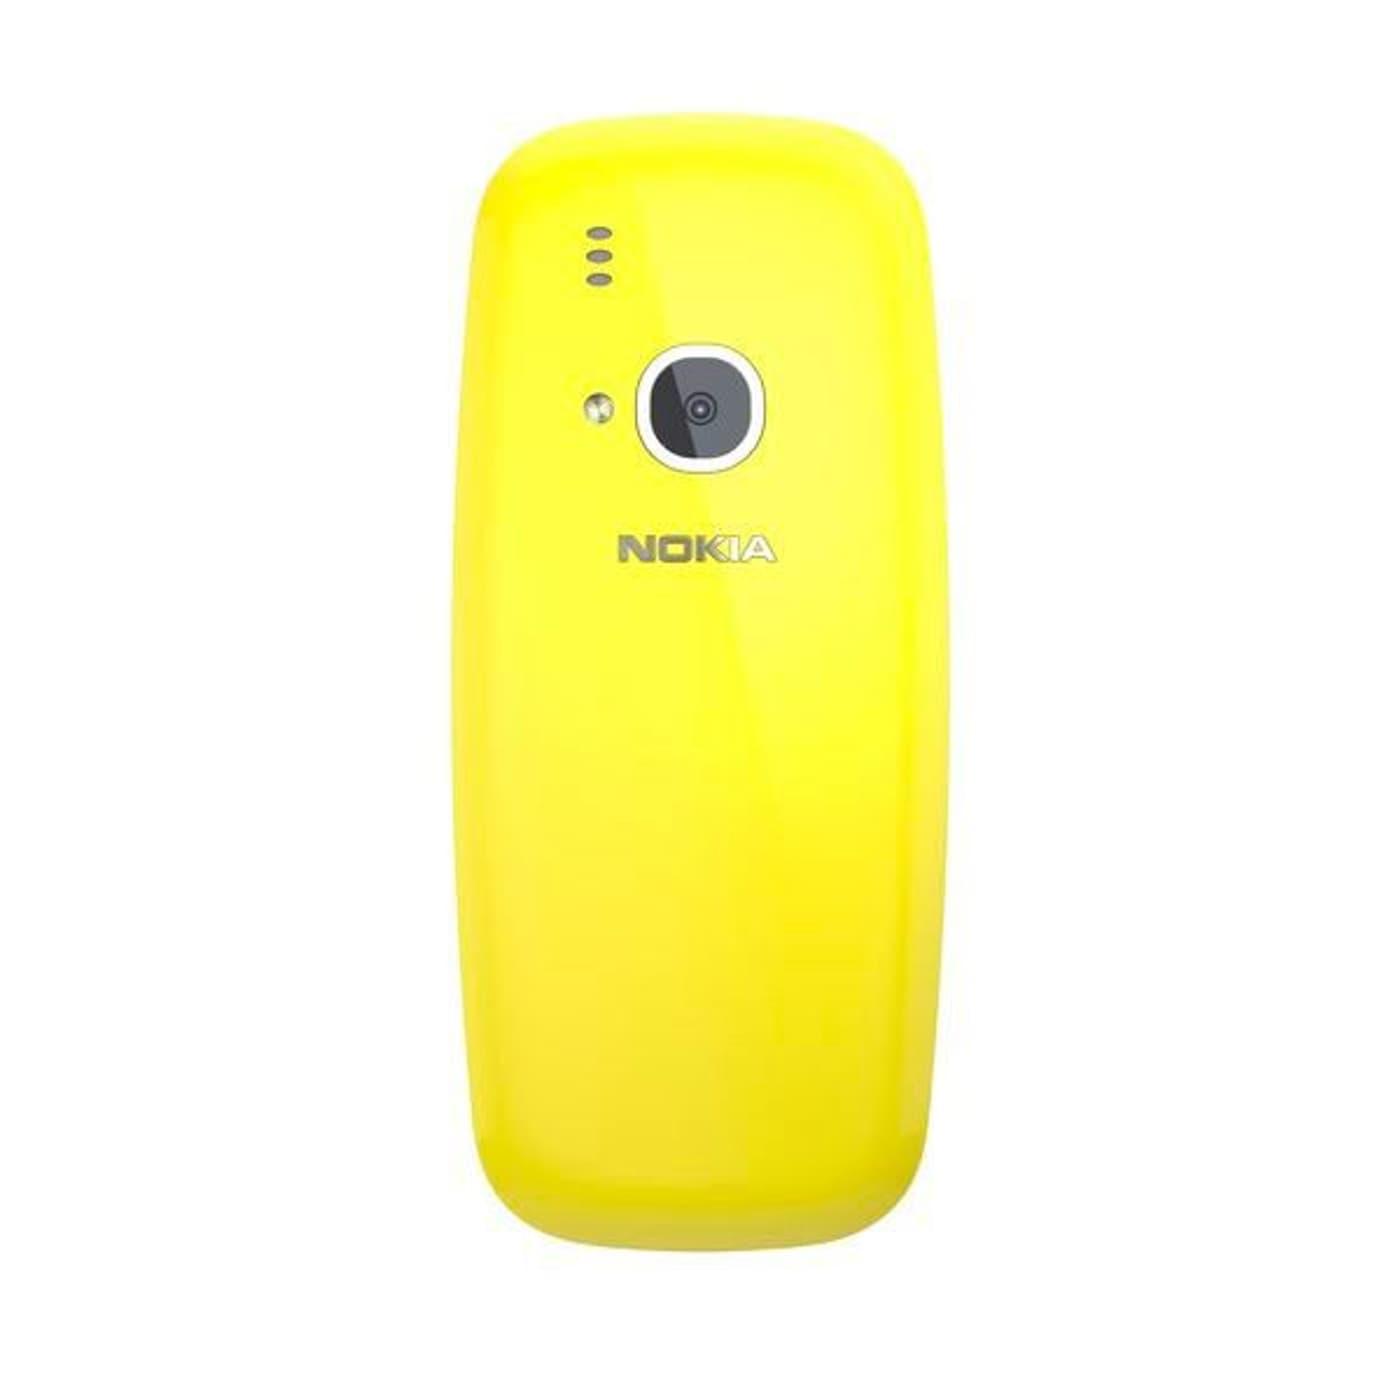 nokia 3310 t lephone mobile jaune migros. Black Bedroom Furniture Sets. Home Design Ideas